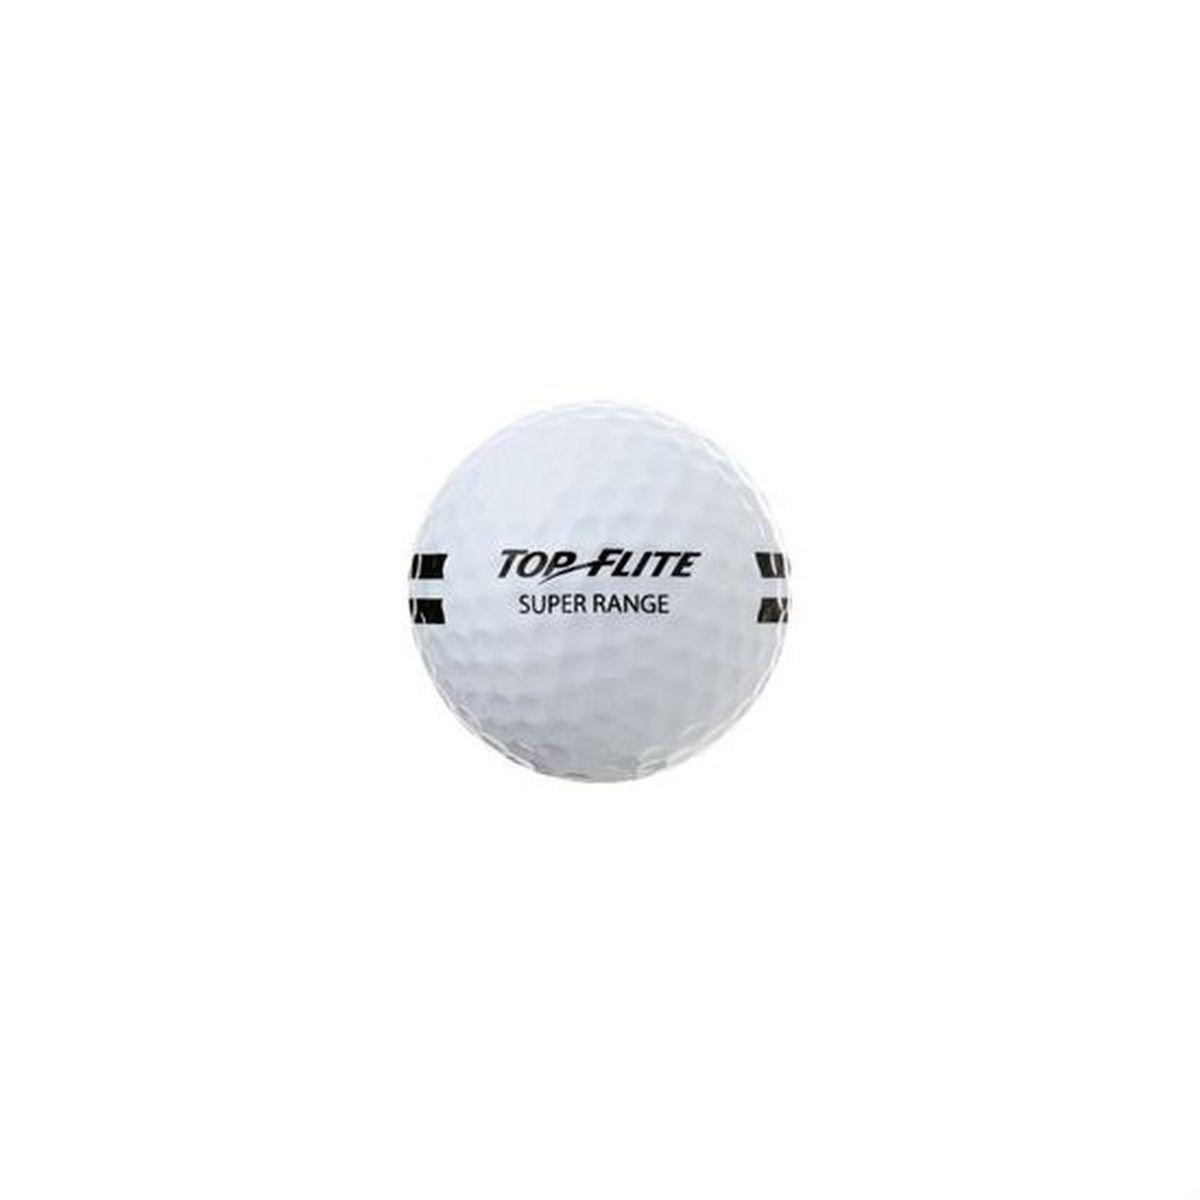 24 Pack Top Flite Super Range Golf Balls - White by Top Flight